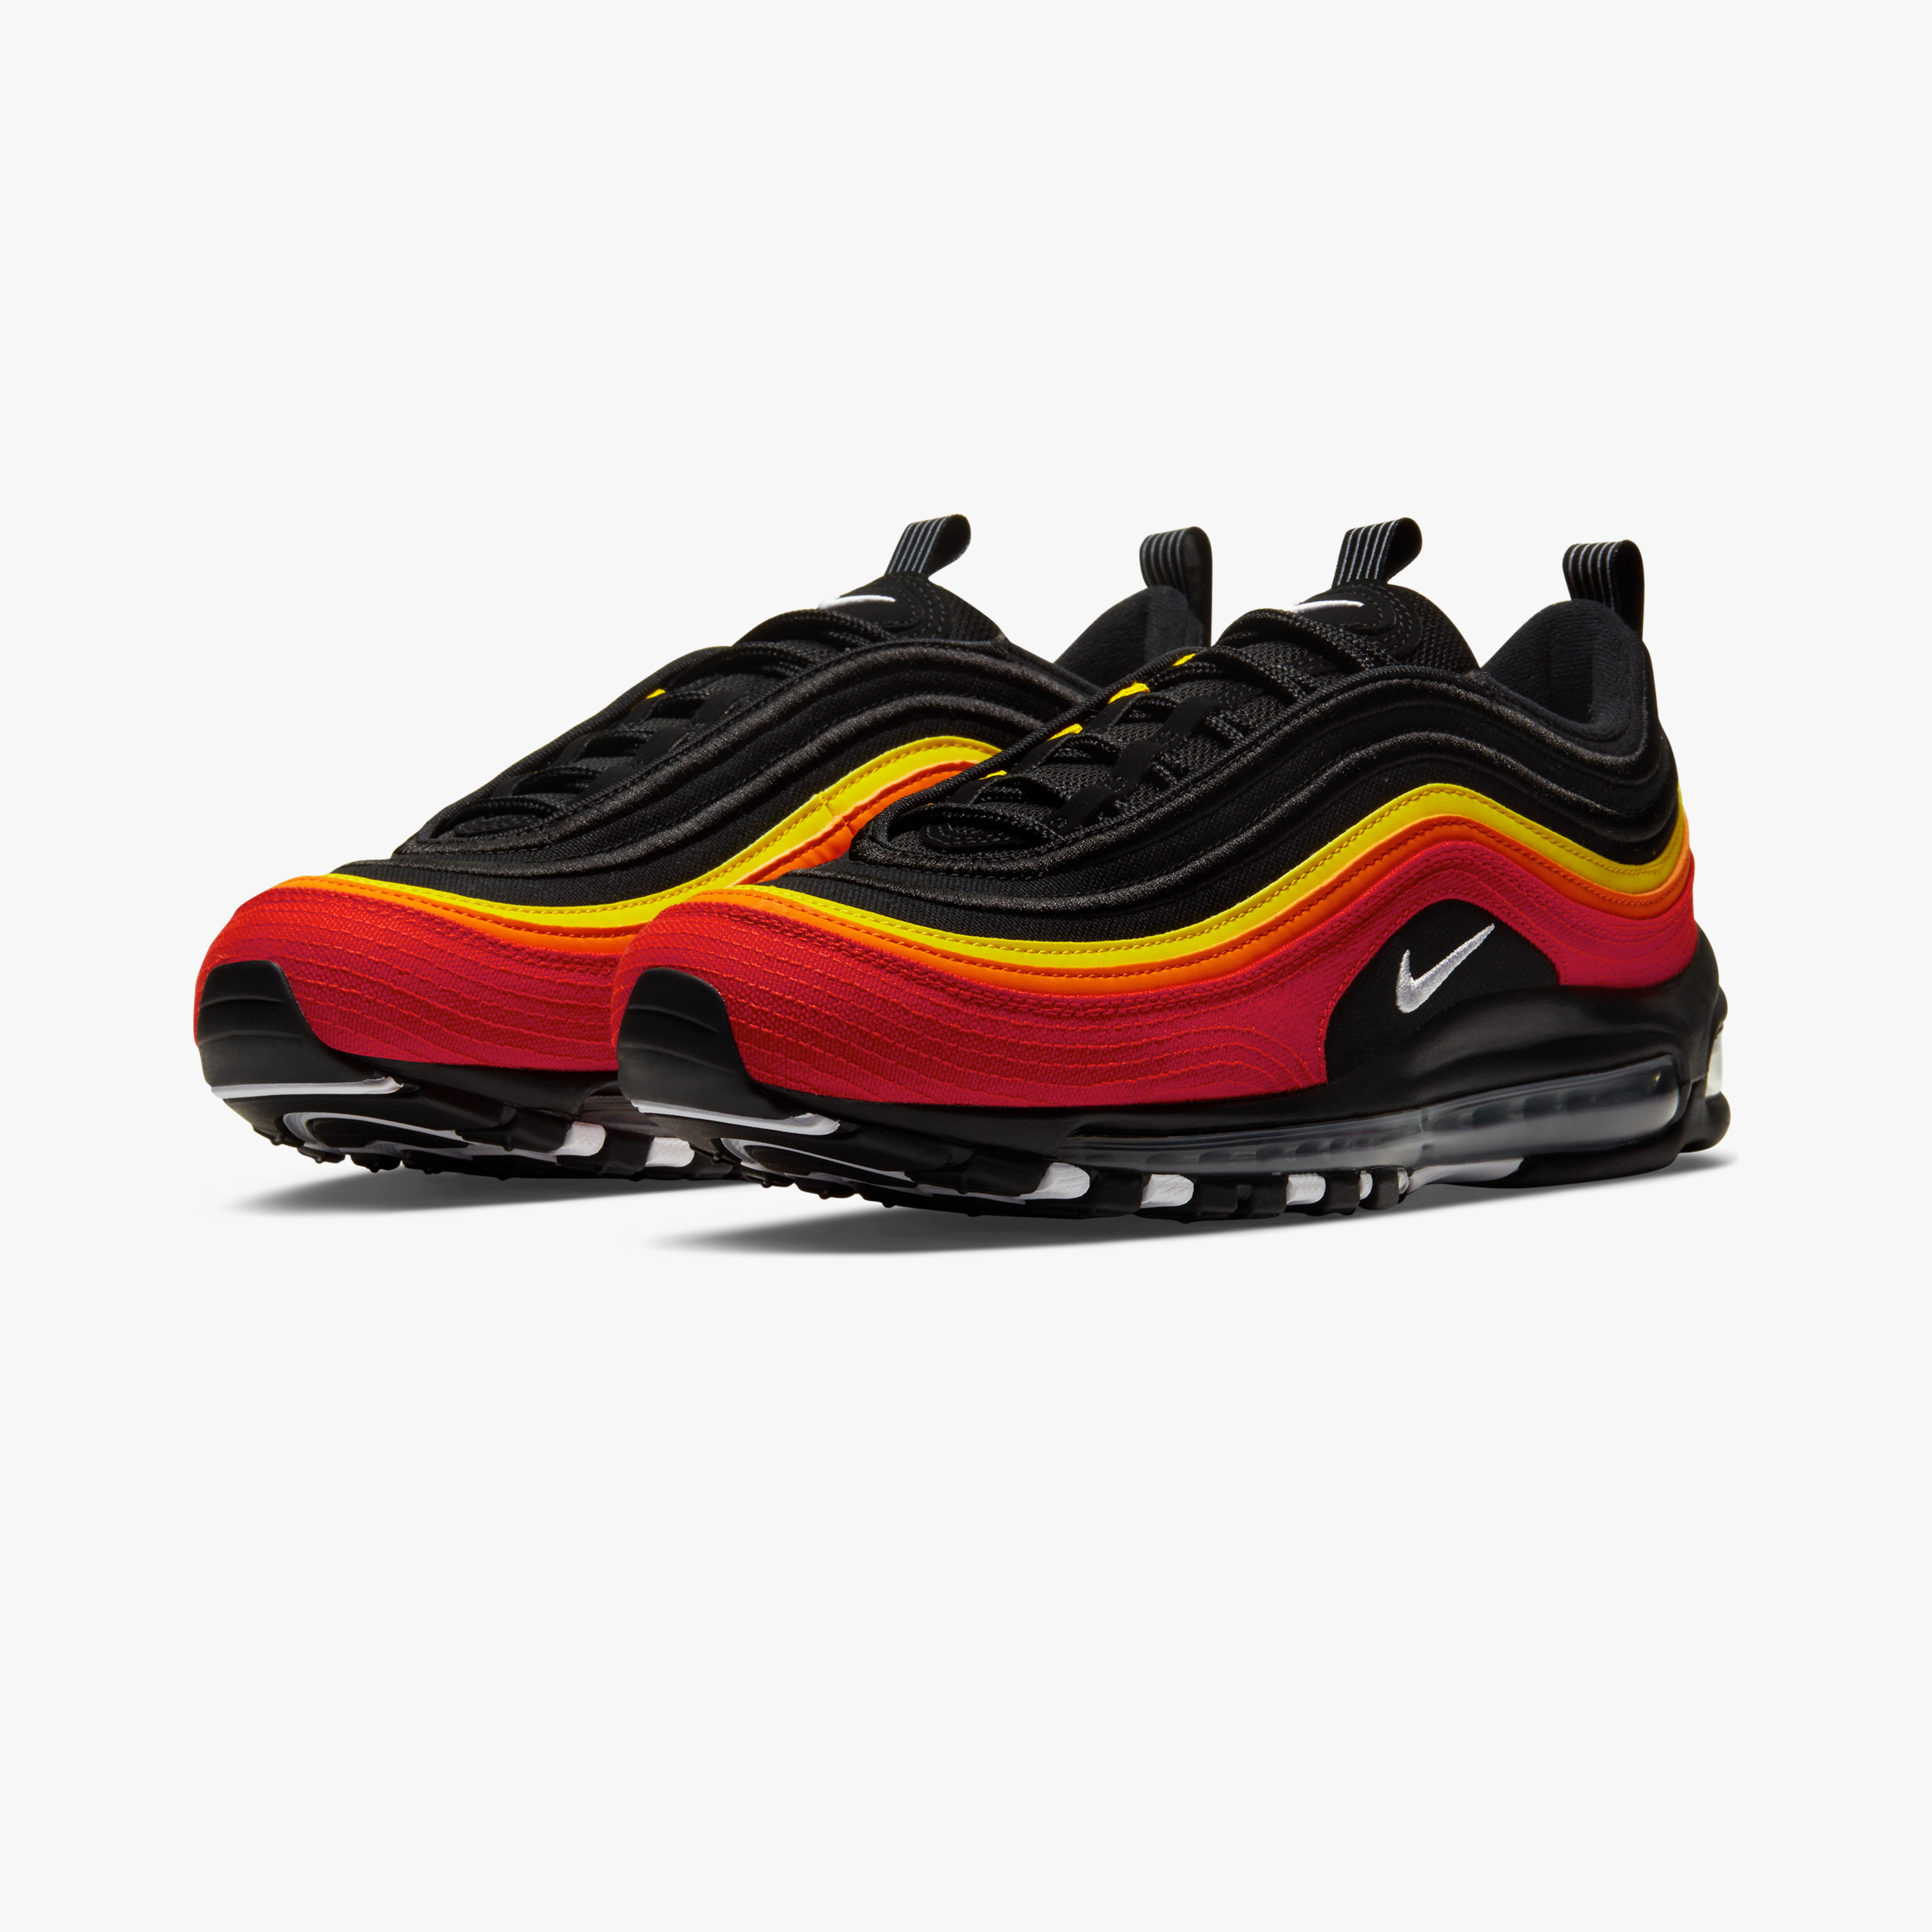 Nike Air Max 97 QS - Ct4525-001 - SNS | sneakers & streetwear ...